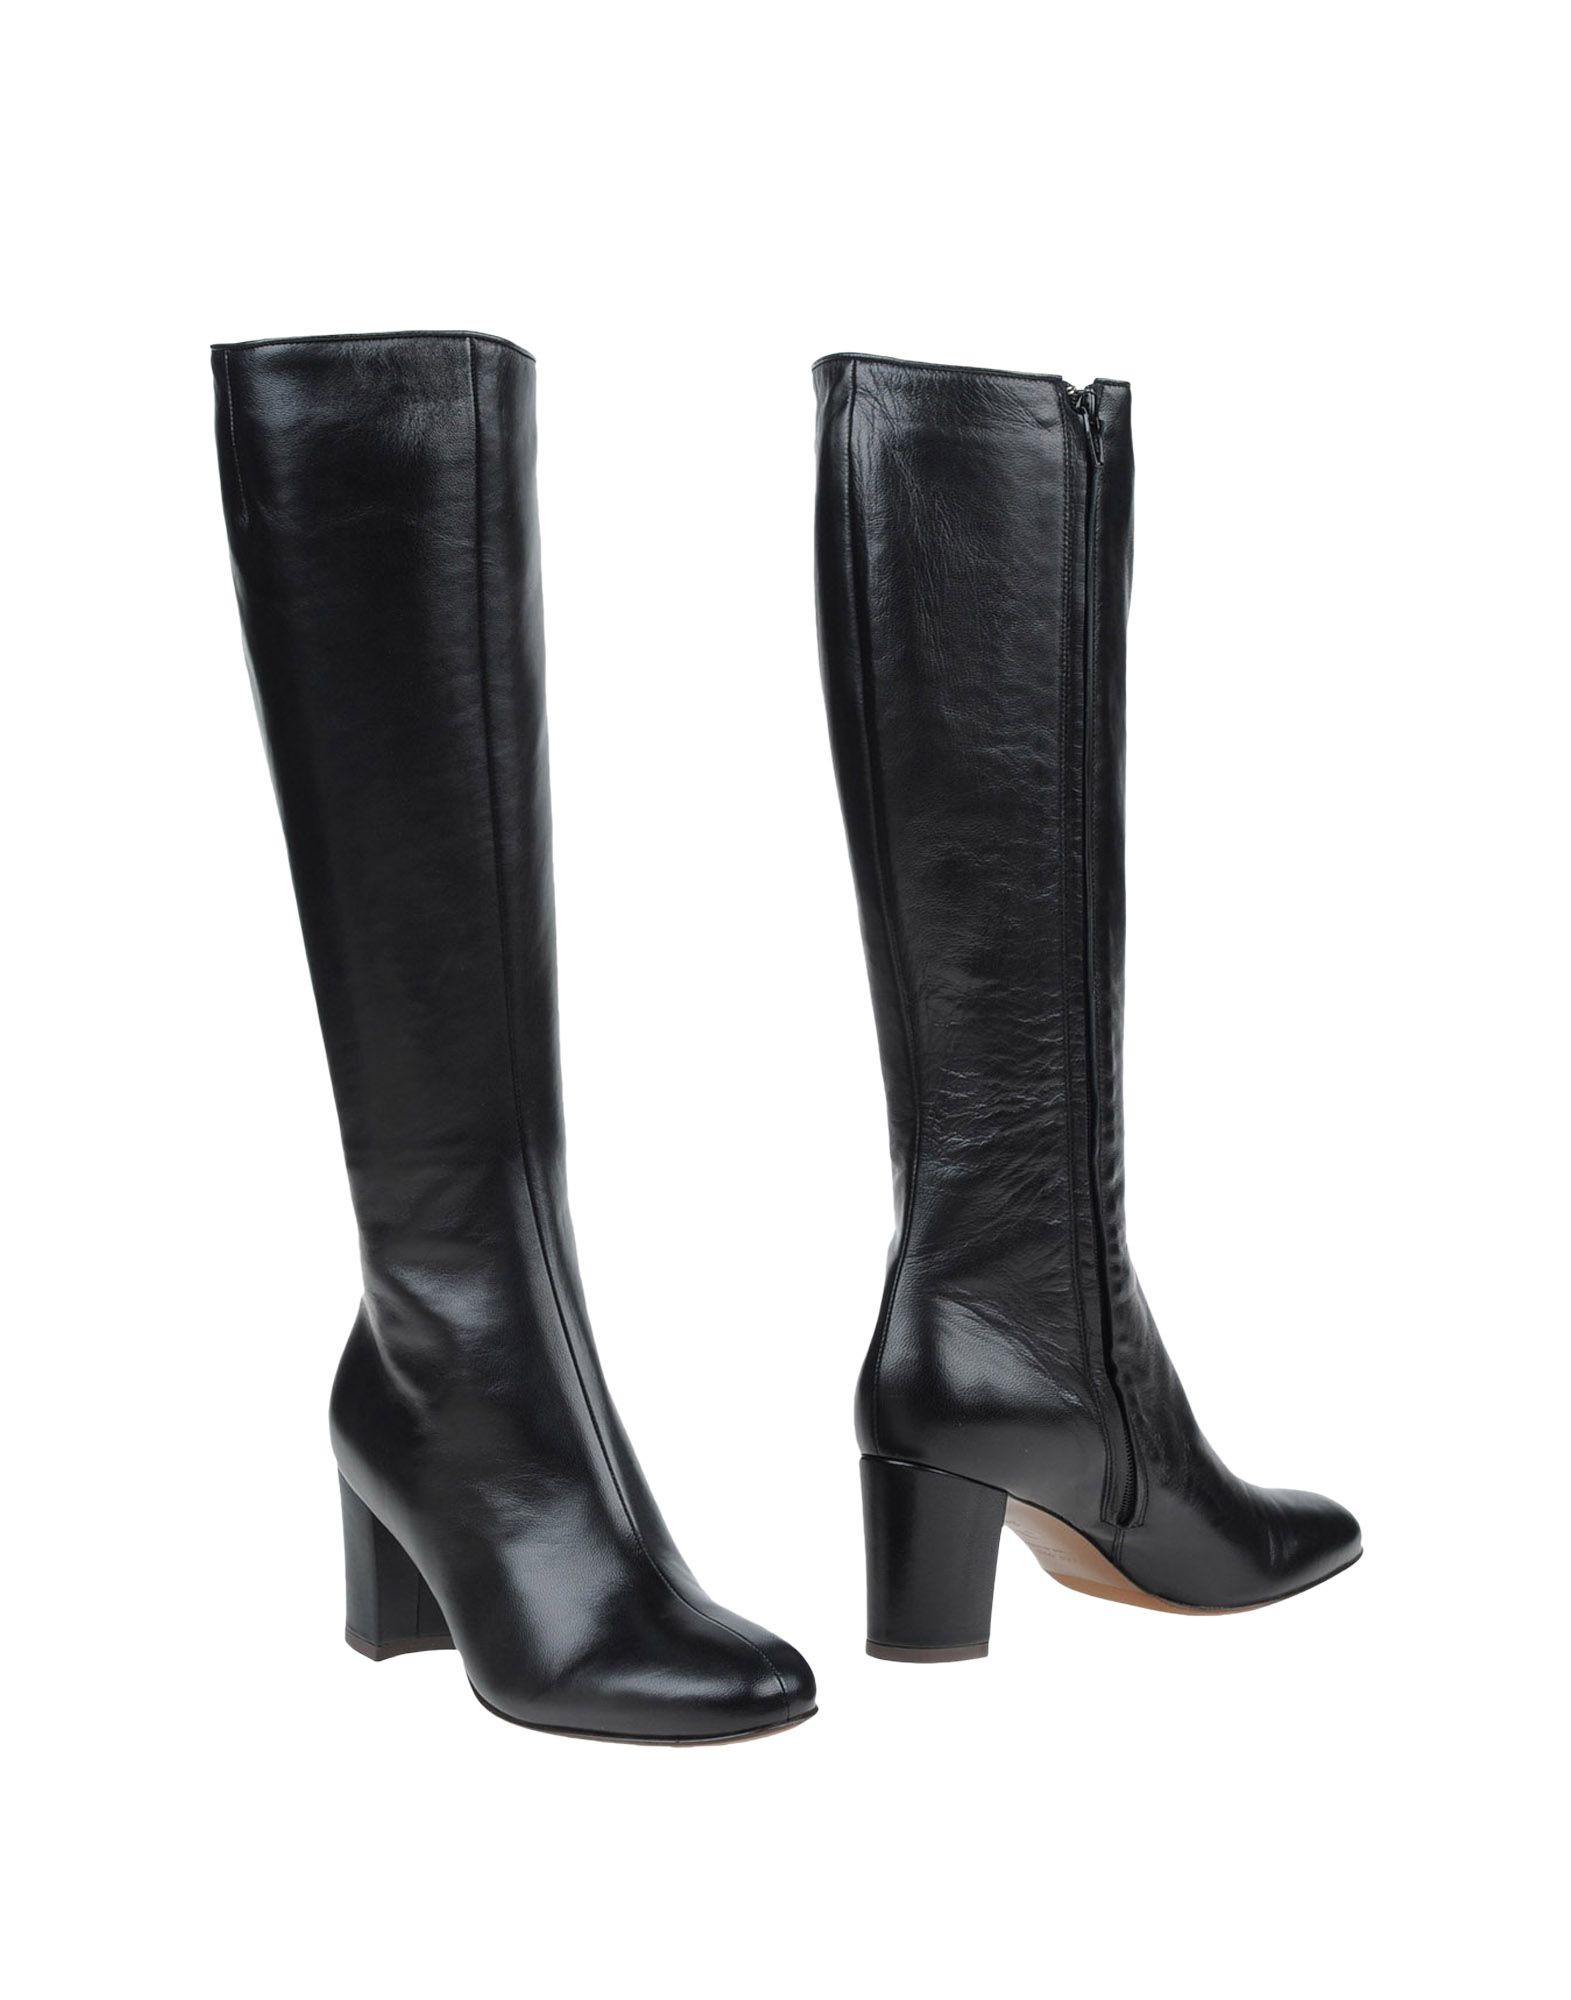 lyst l 39 autre chose boots in black. Black Bedroom Furniture Sets. Home Design Ideas